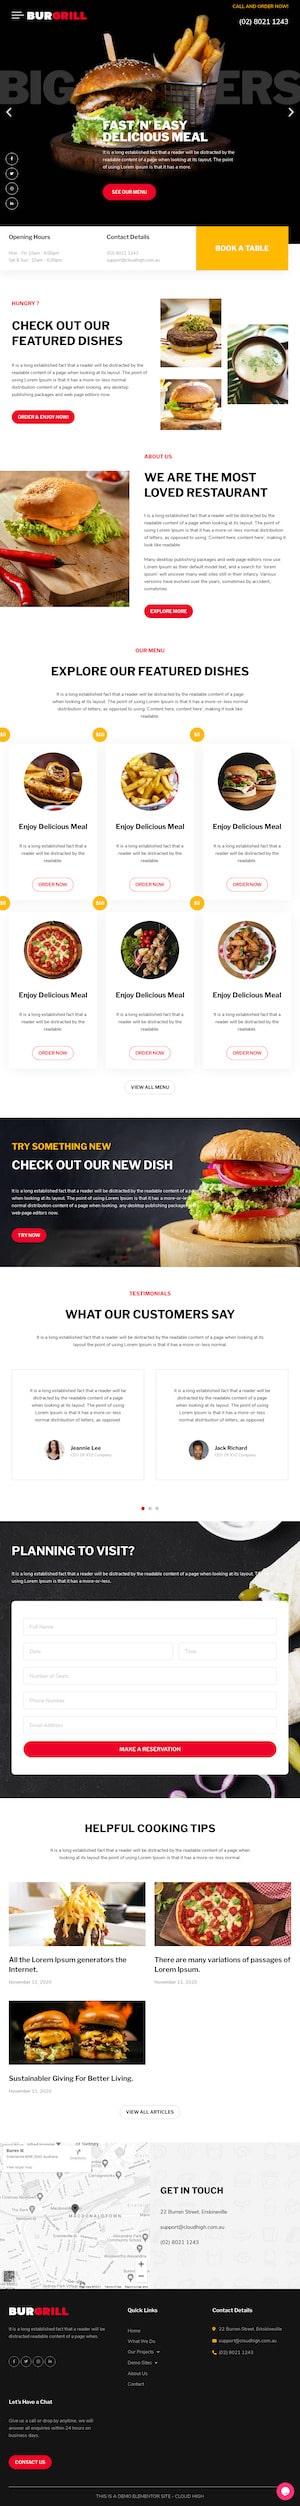 Burger Restaurant - Elementor Template Website - Cloud High Sydney WordPress Websites